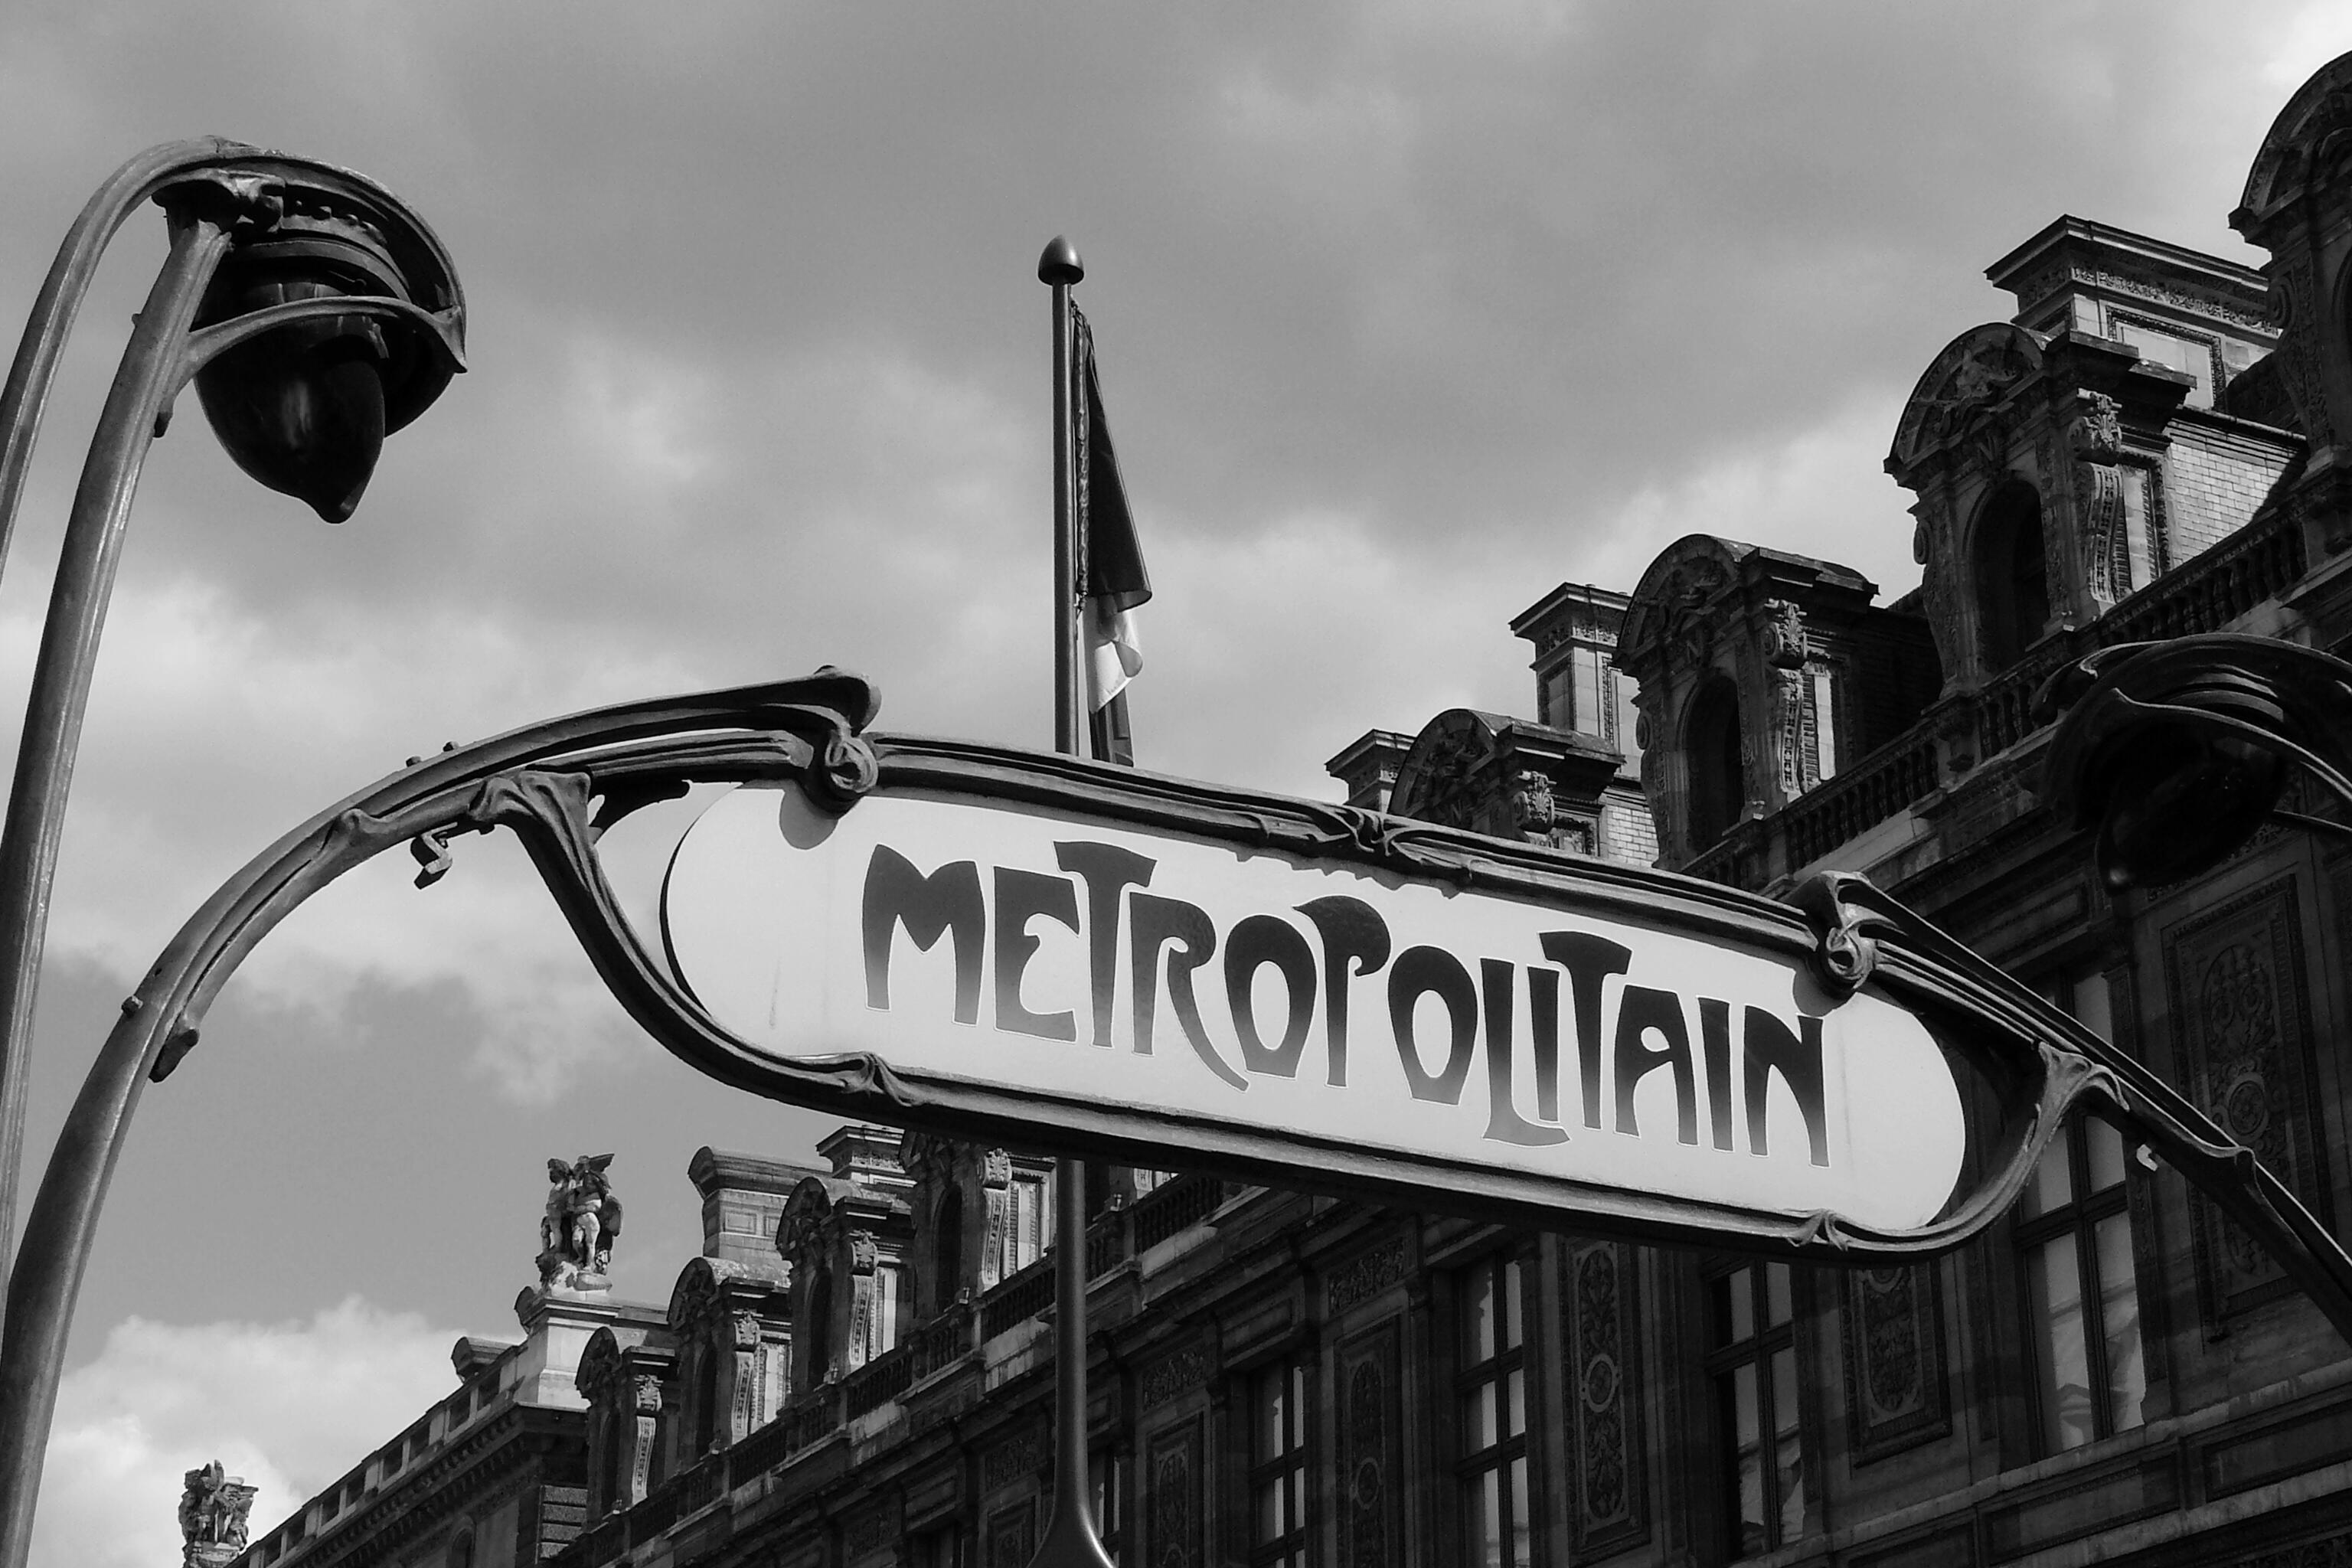 Free images black and white architecture road street building paris france close metro station capital district shield art nouveau input